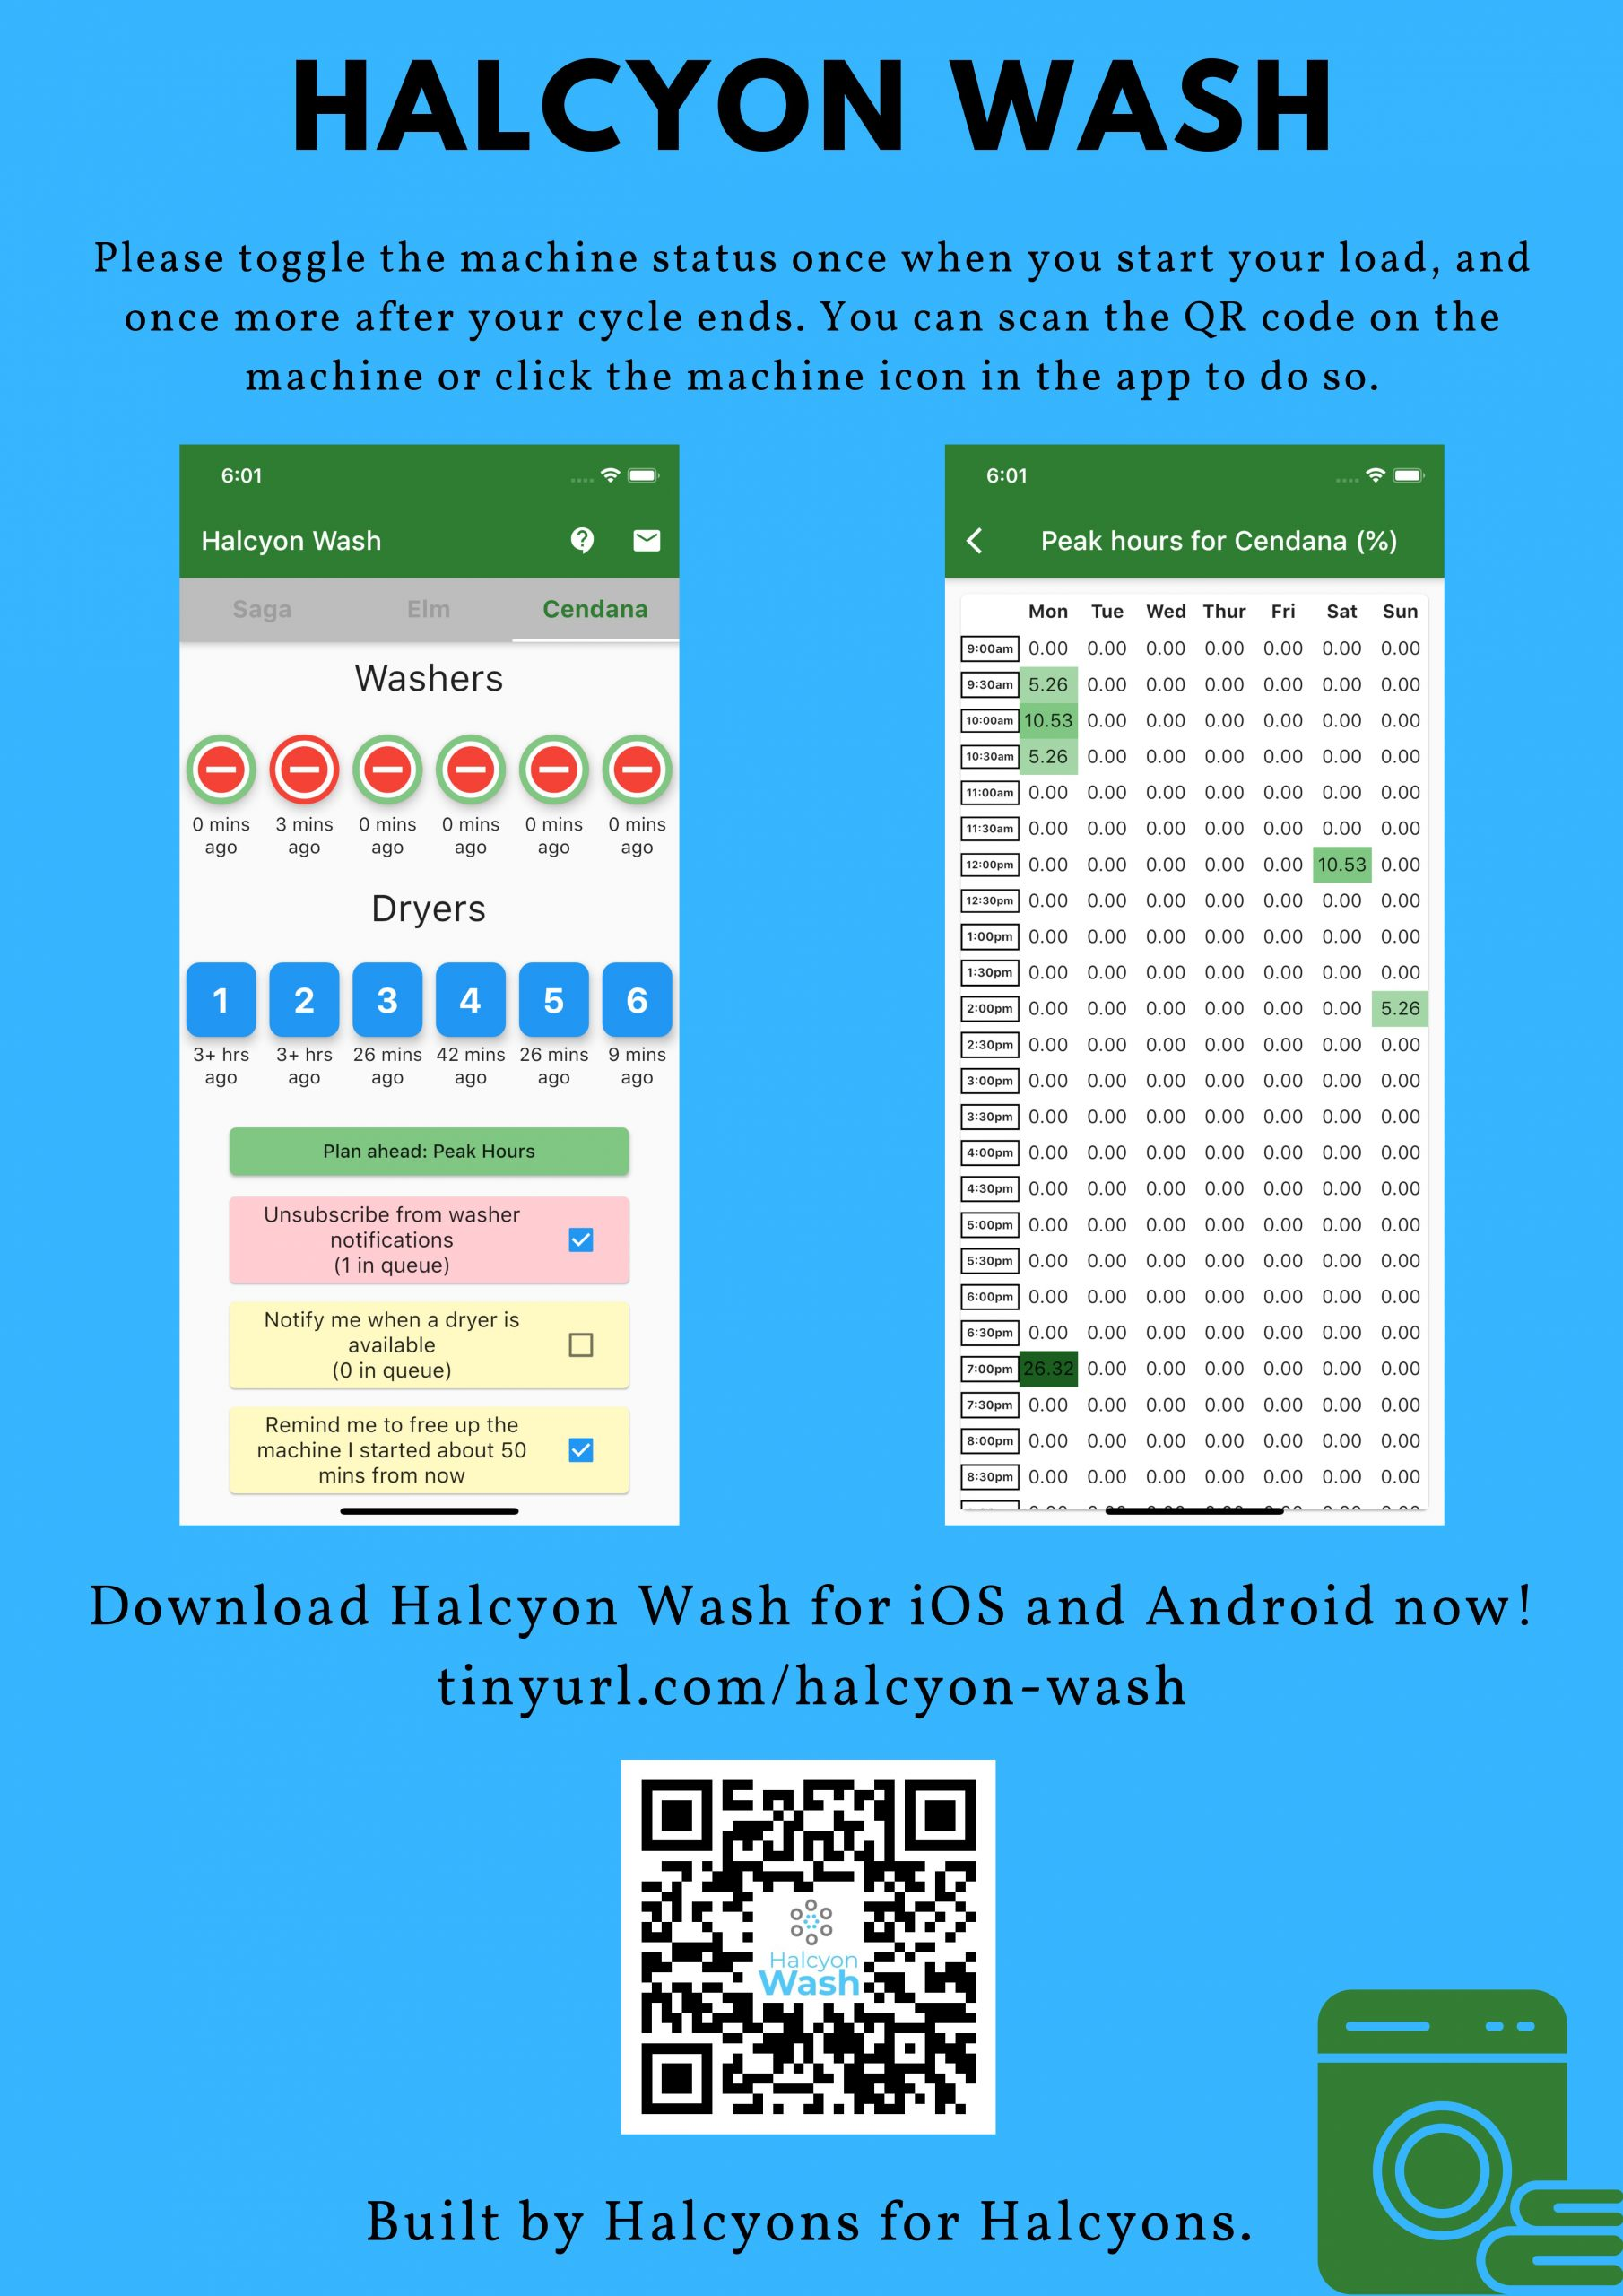 Halcyon Wash Mobile Application